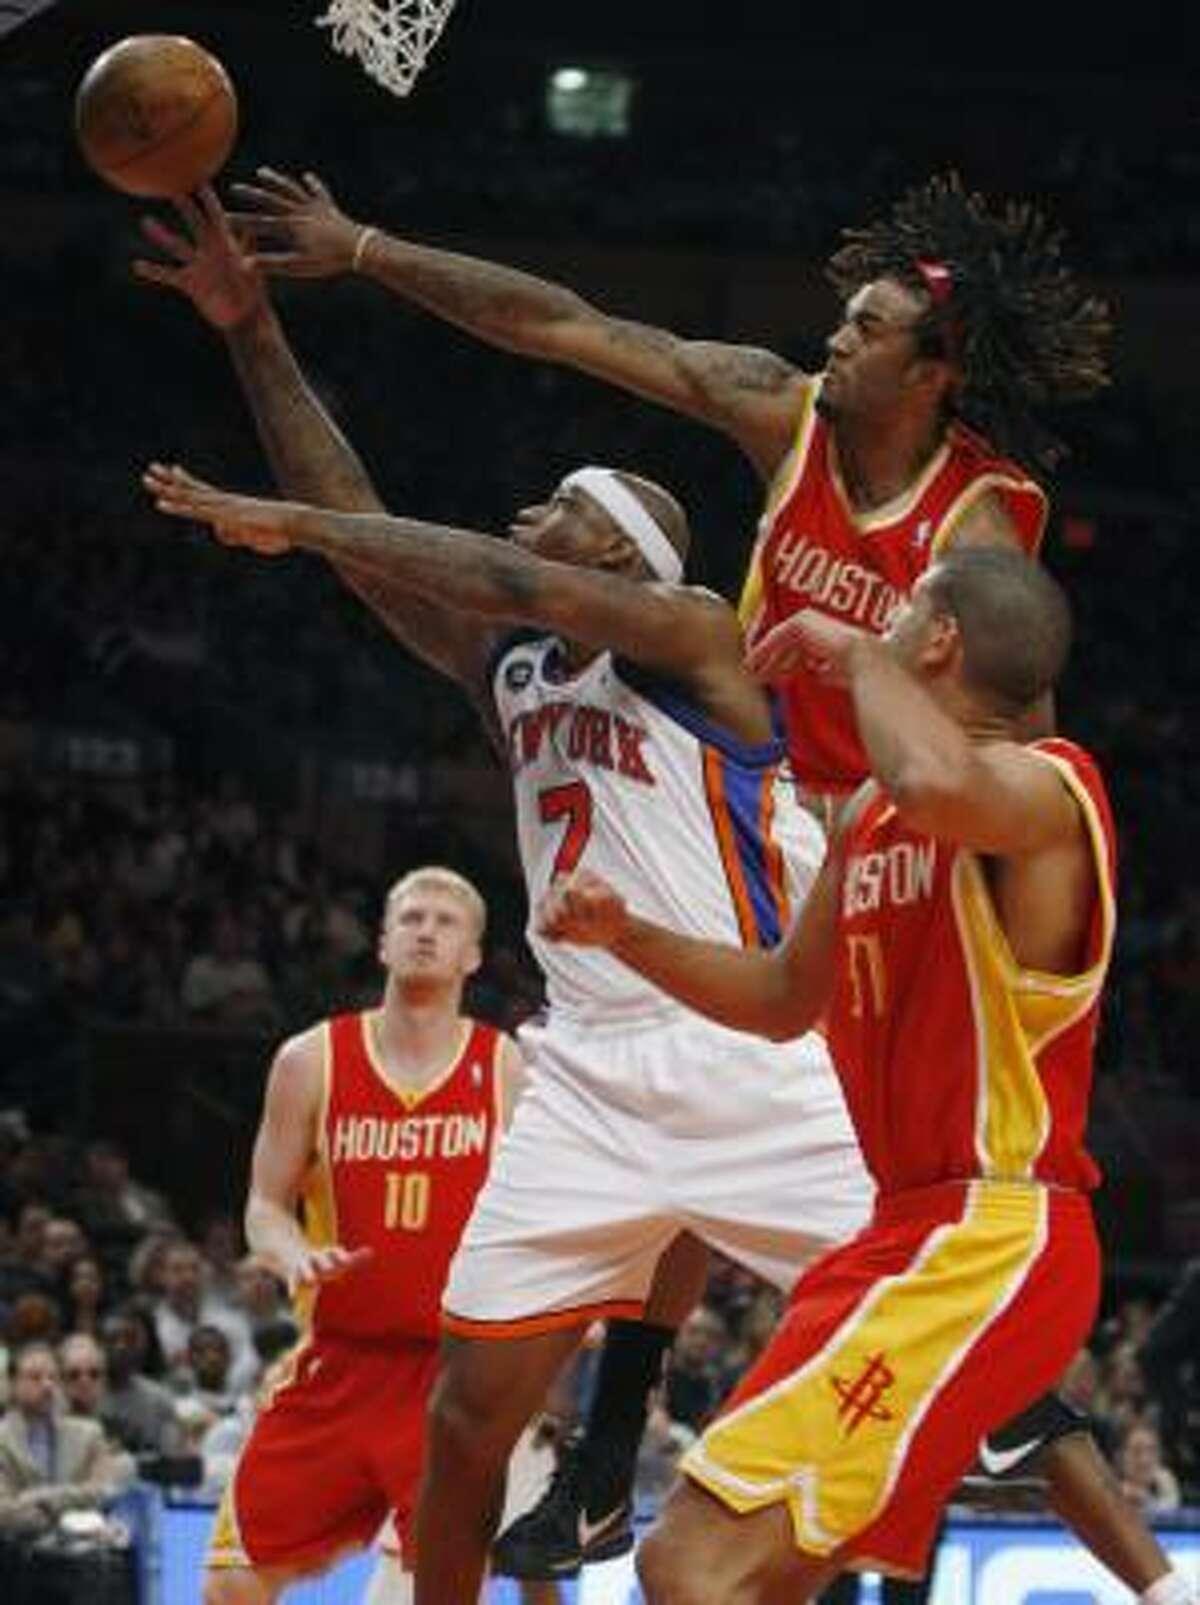 Rockets forward Jordan Hill (27) knocks the ball from New York Knicks forward Al Harrington (7) as Rockets Chase Budinger (10) and Rockets Shane Battier (31) defend.